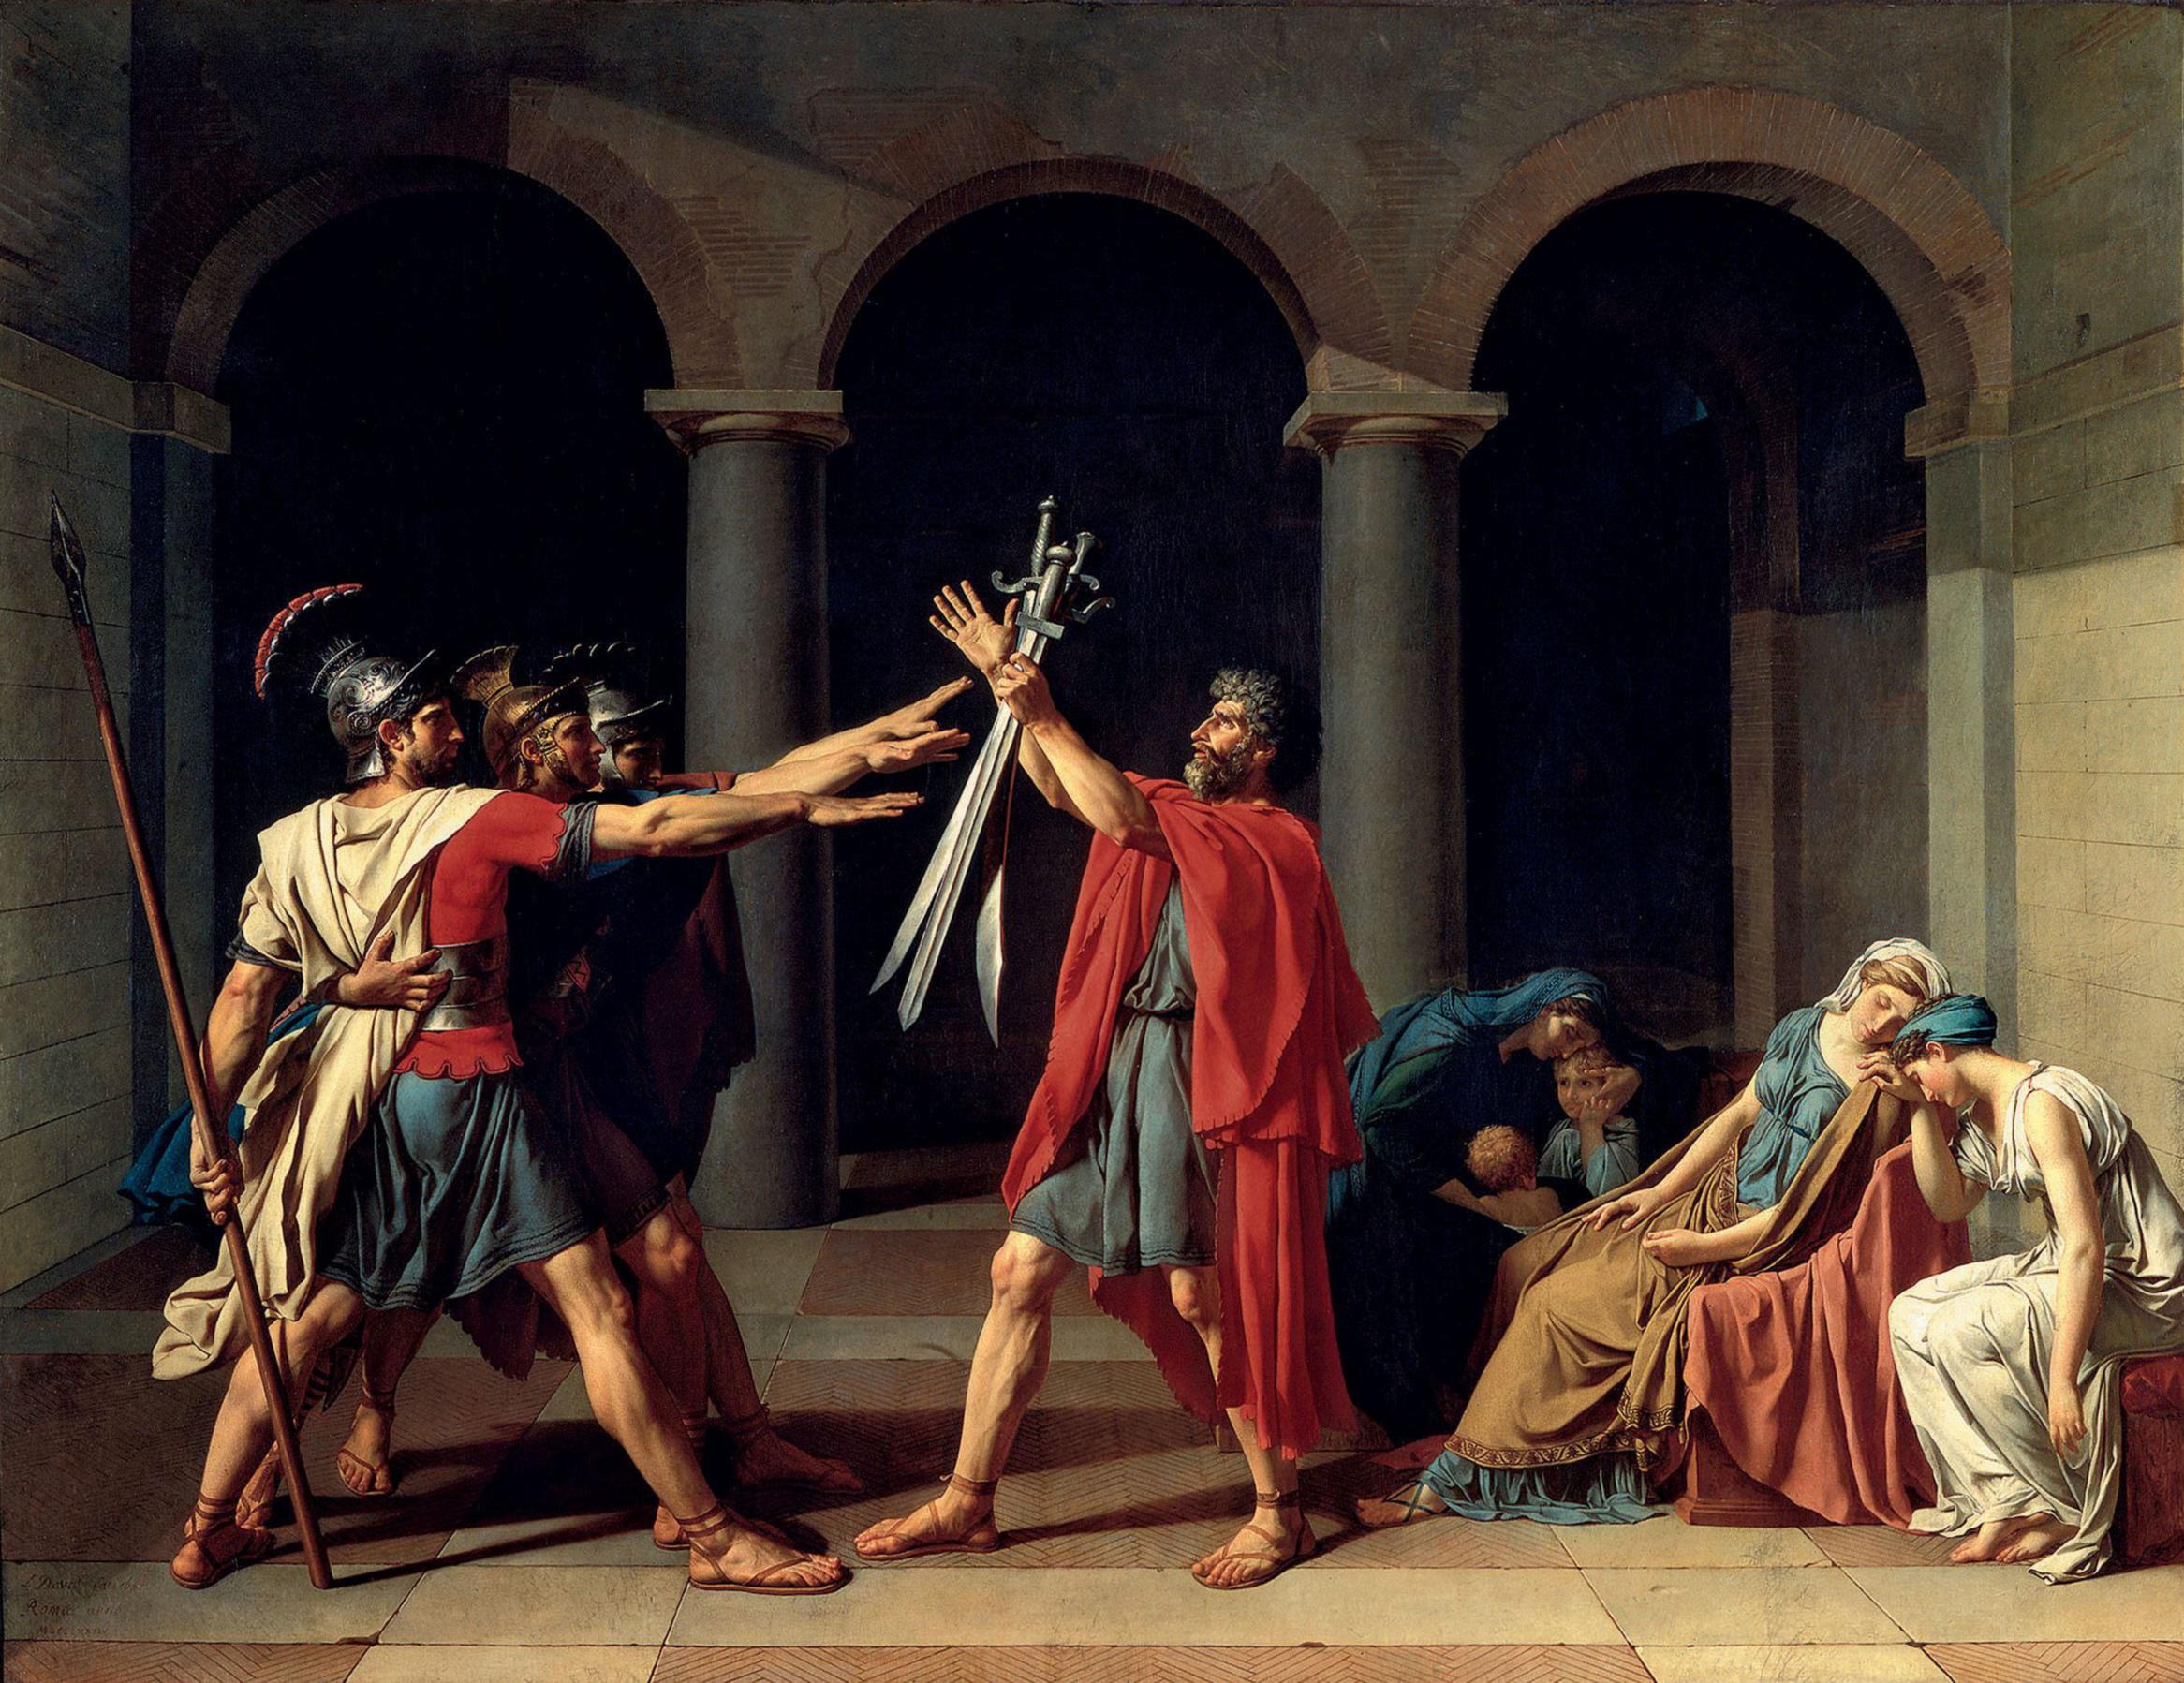 "Jacques-Louis David, Oath of the Horatii, 1784. Oil on canvas, 10' 10"" x 13' 11"". Musee du Louvre, Paris."